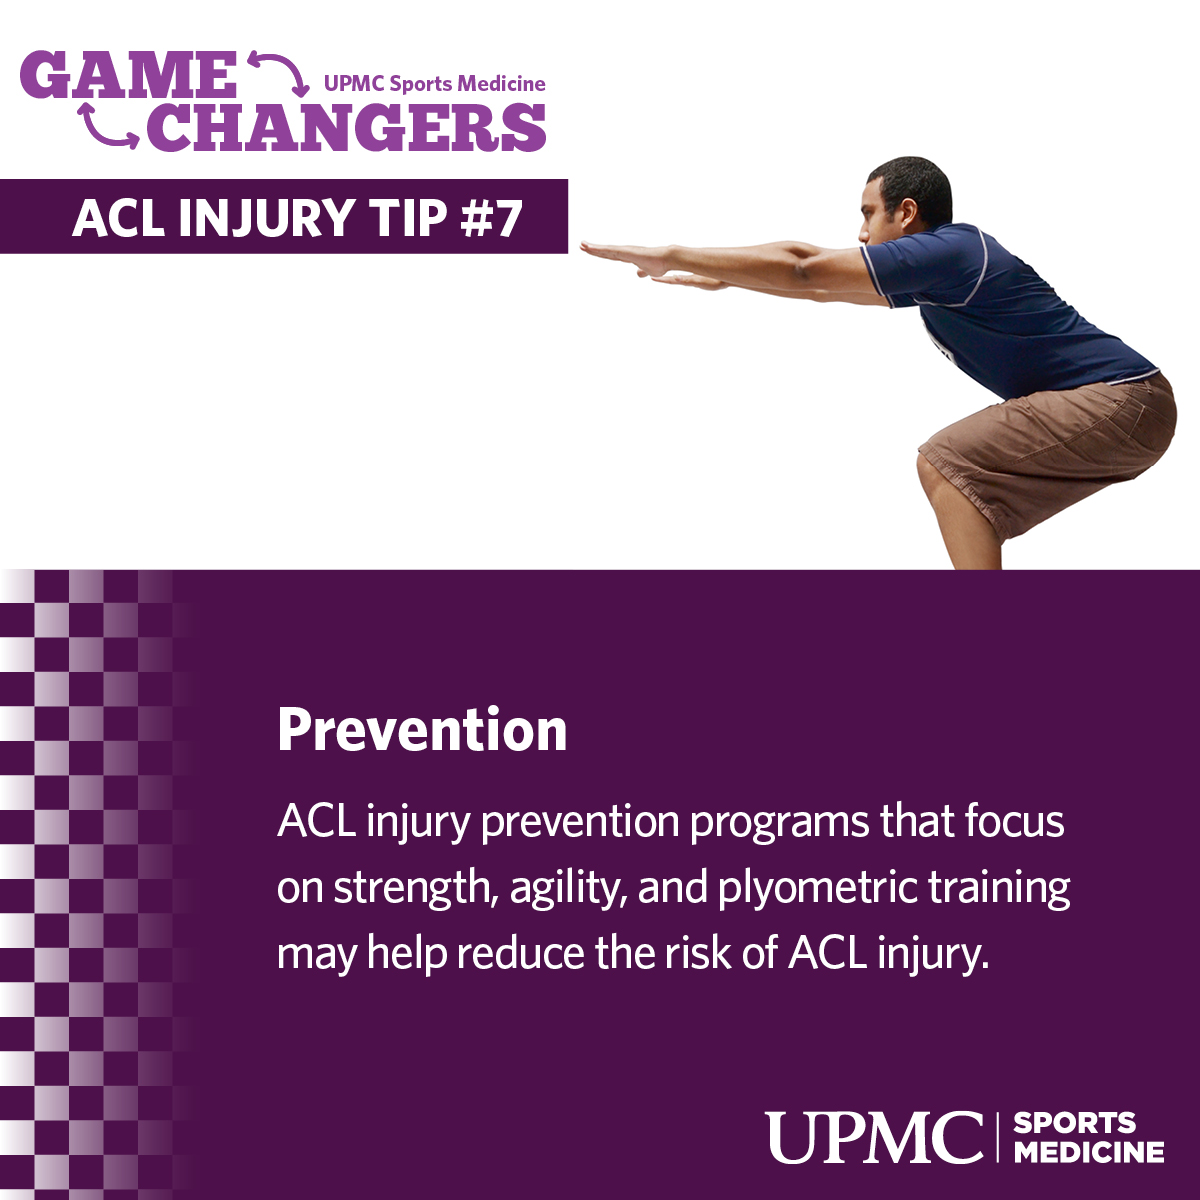 UPMC_GameChangers_ACL_FB7_FINAL